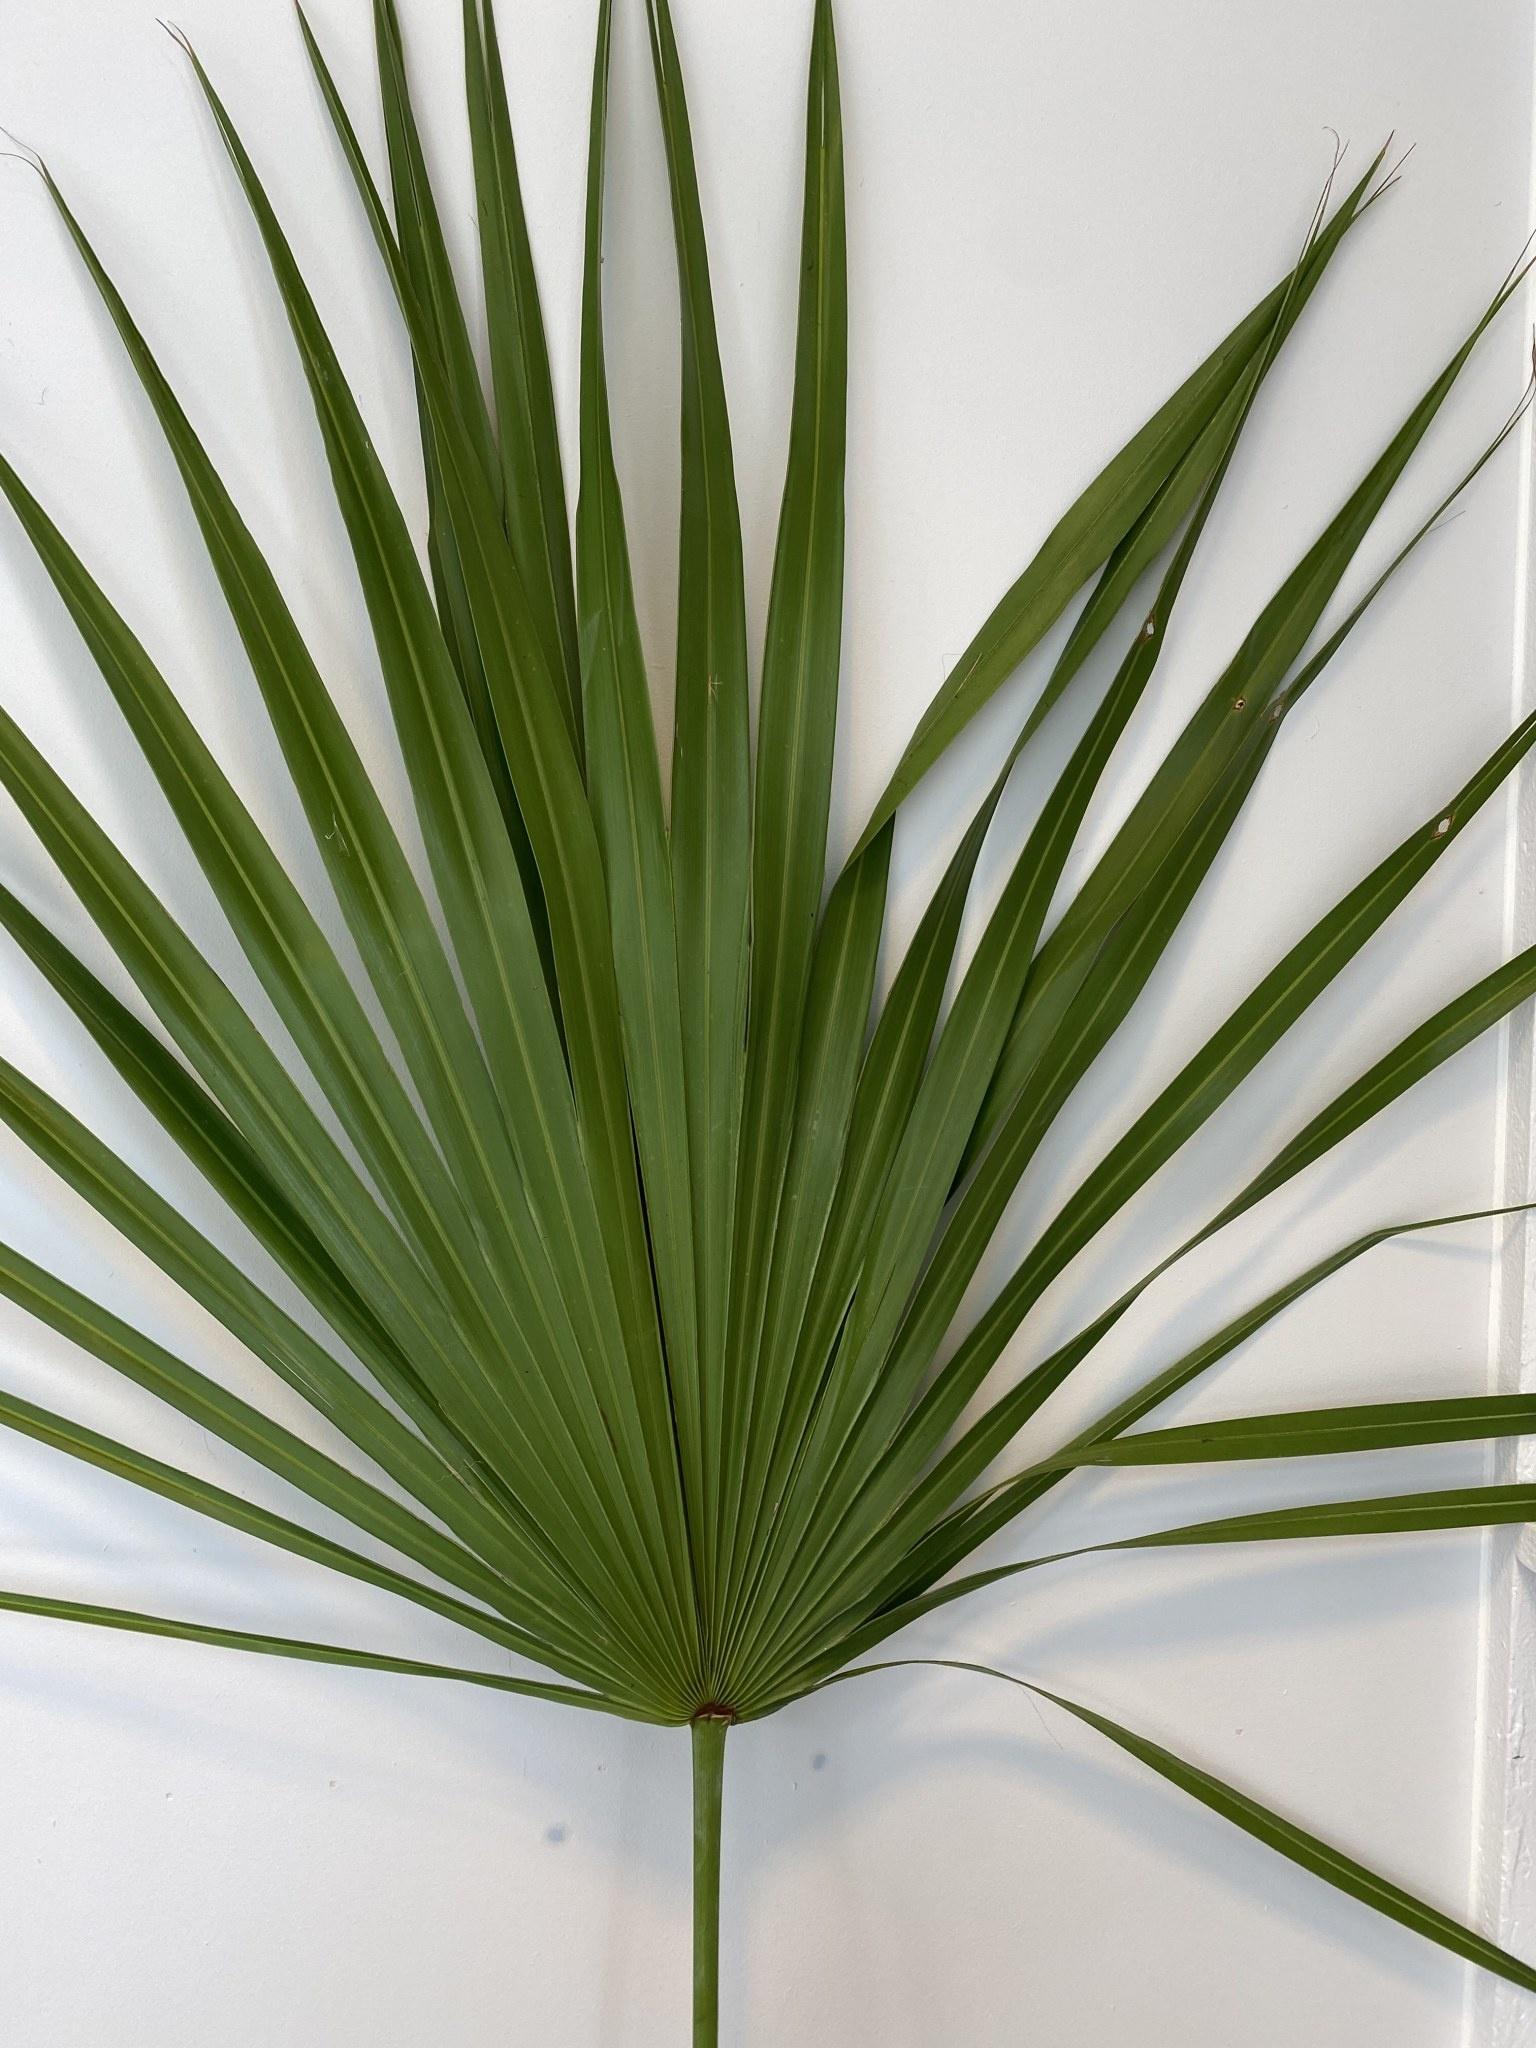 Gedroogd Palmblad-1